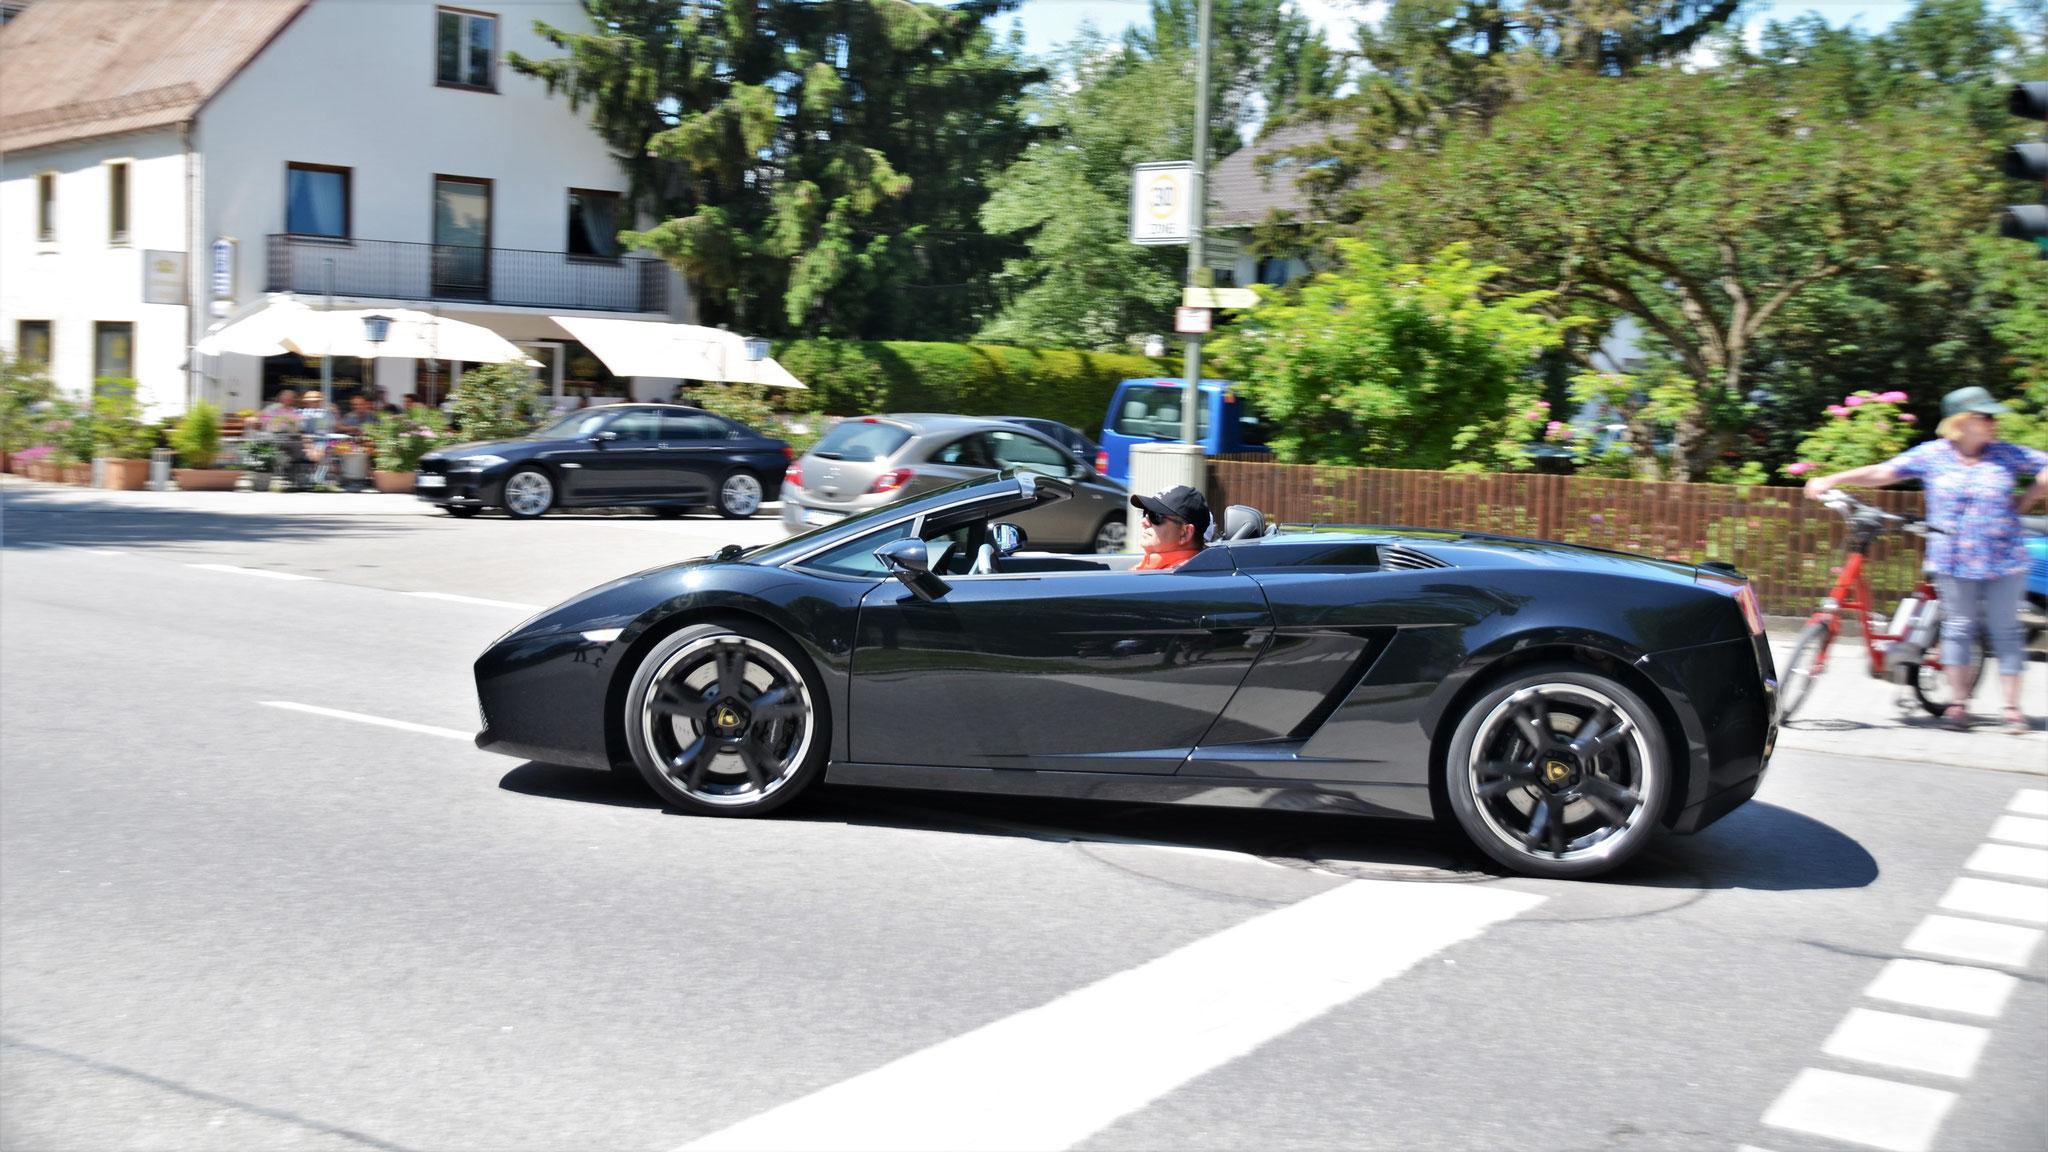 Lamborghini Gallardo Spyder - ED-WH-5